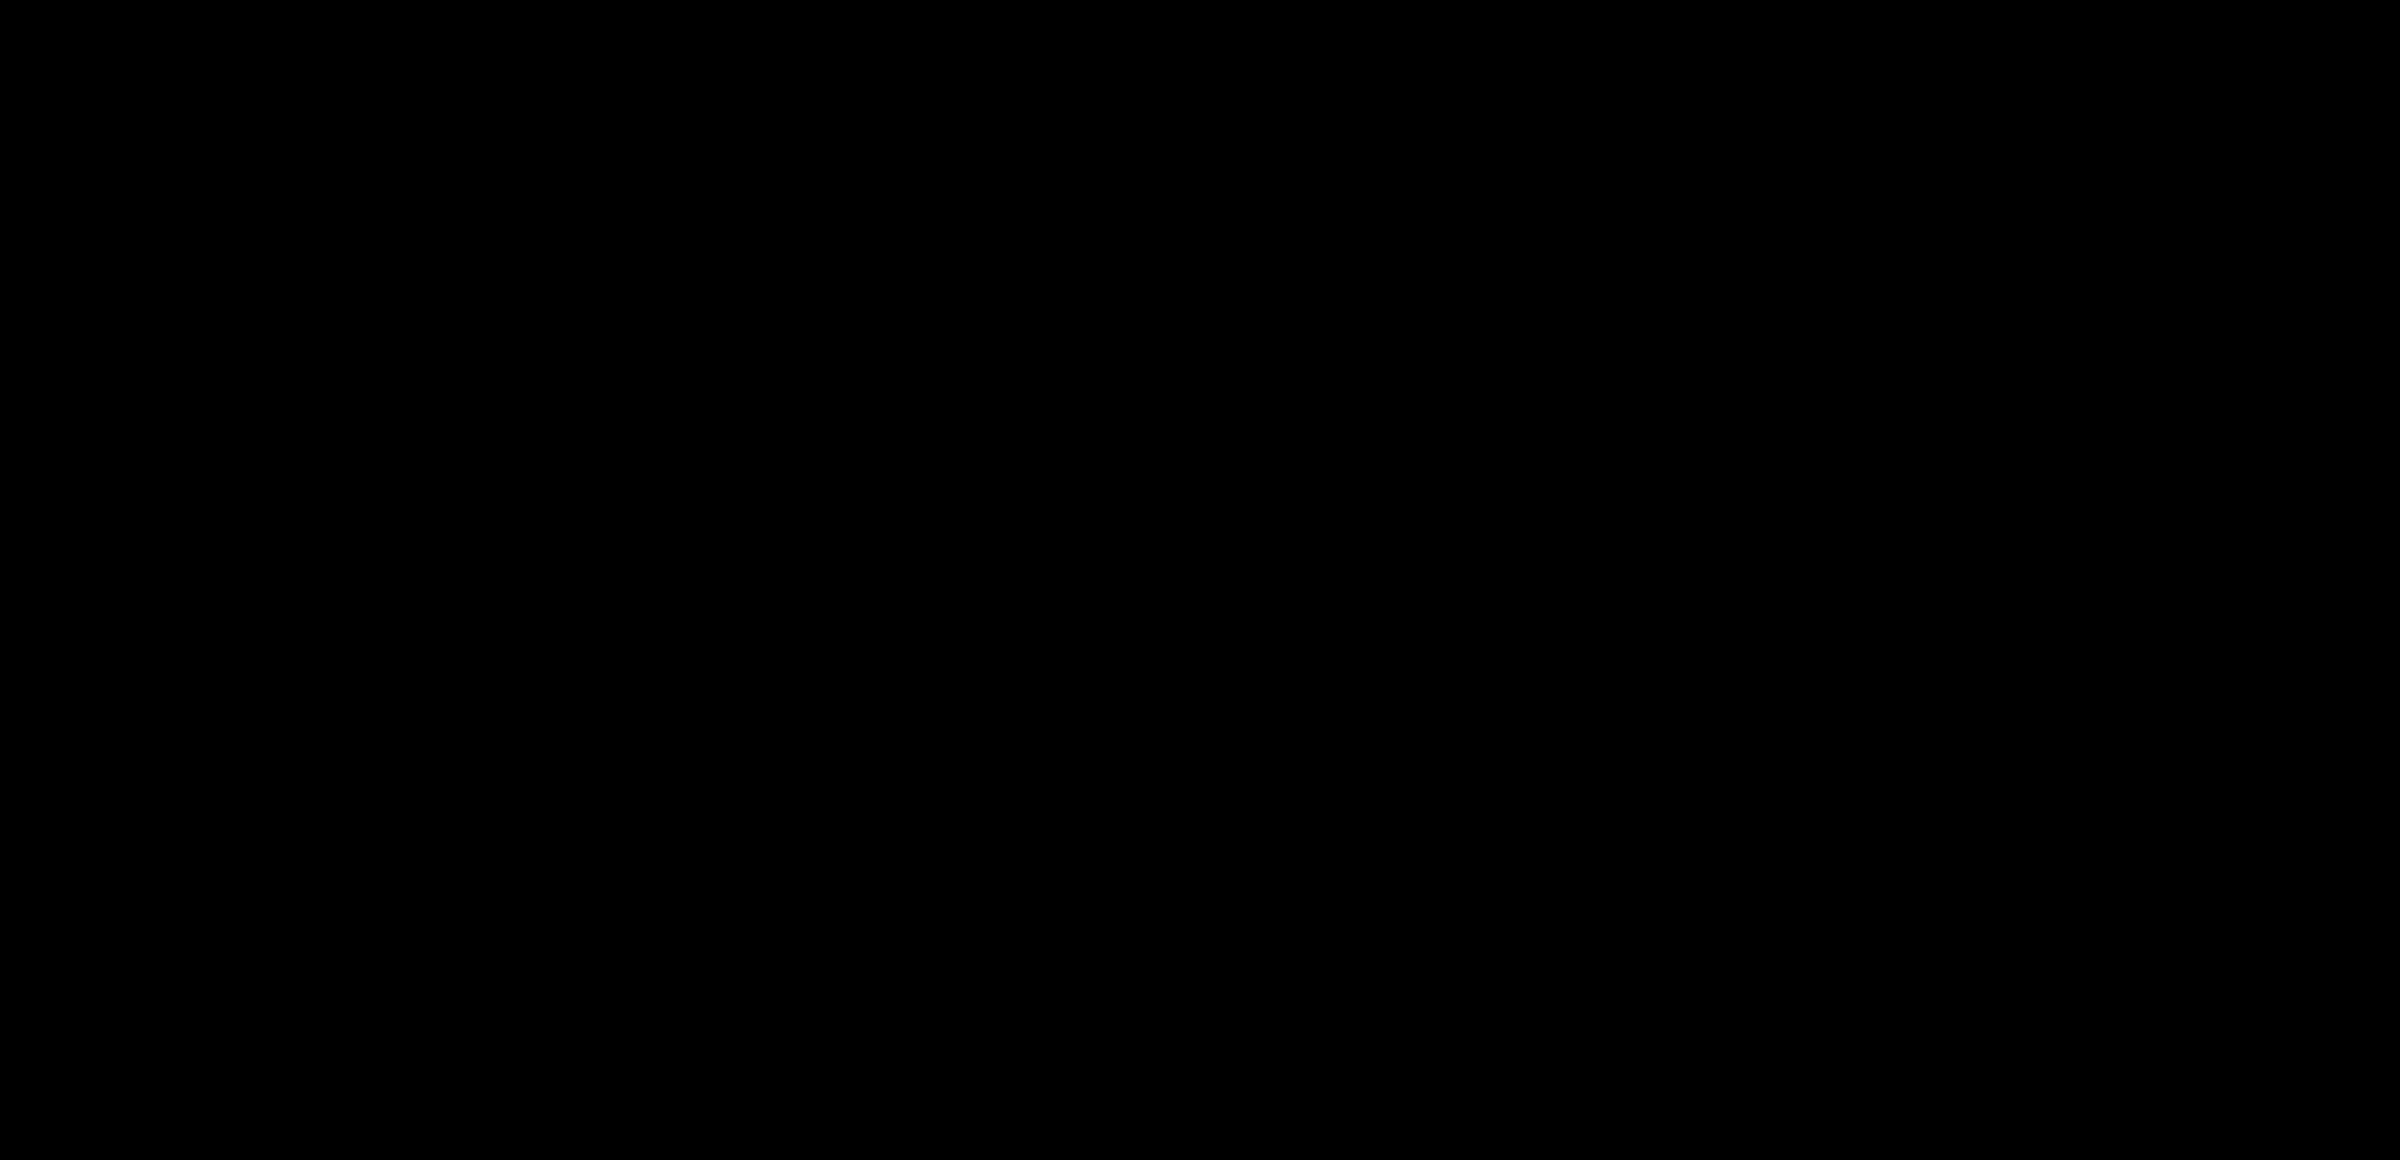 Bet logo clipart clipart free stock Clip Art Bet Logo Png - Bet Logo Png Transparent Png - Full Size ... clipart free stock